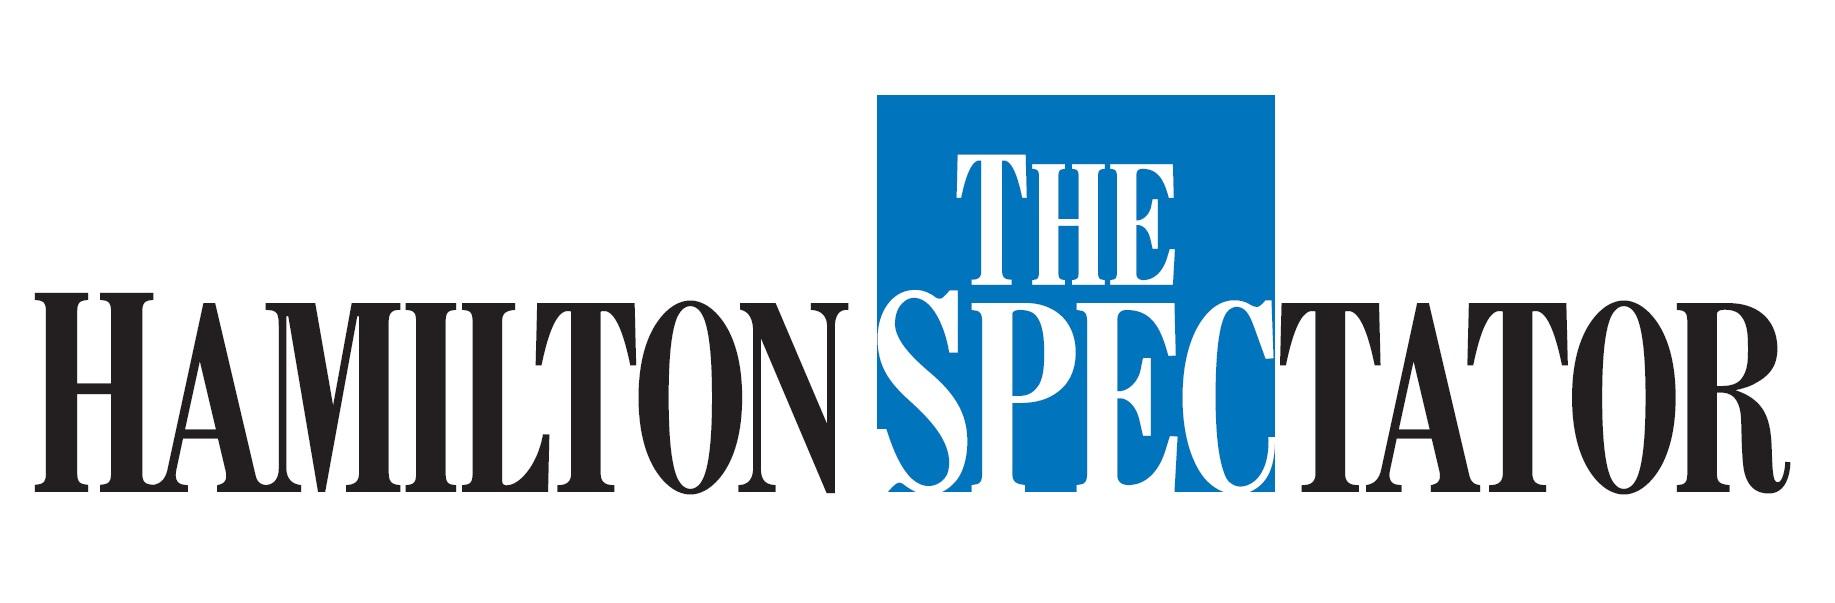 The Hamilton Spectator logo.jpg